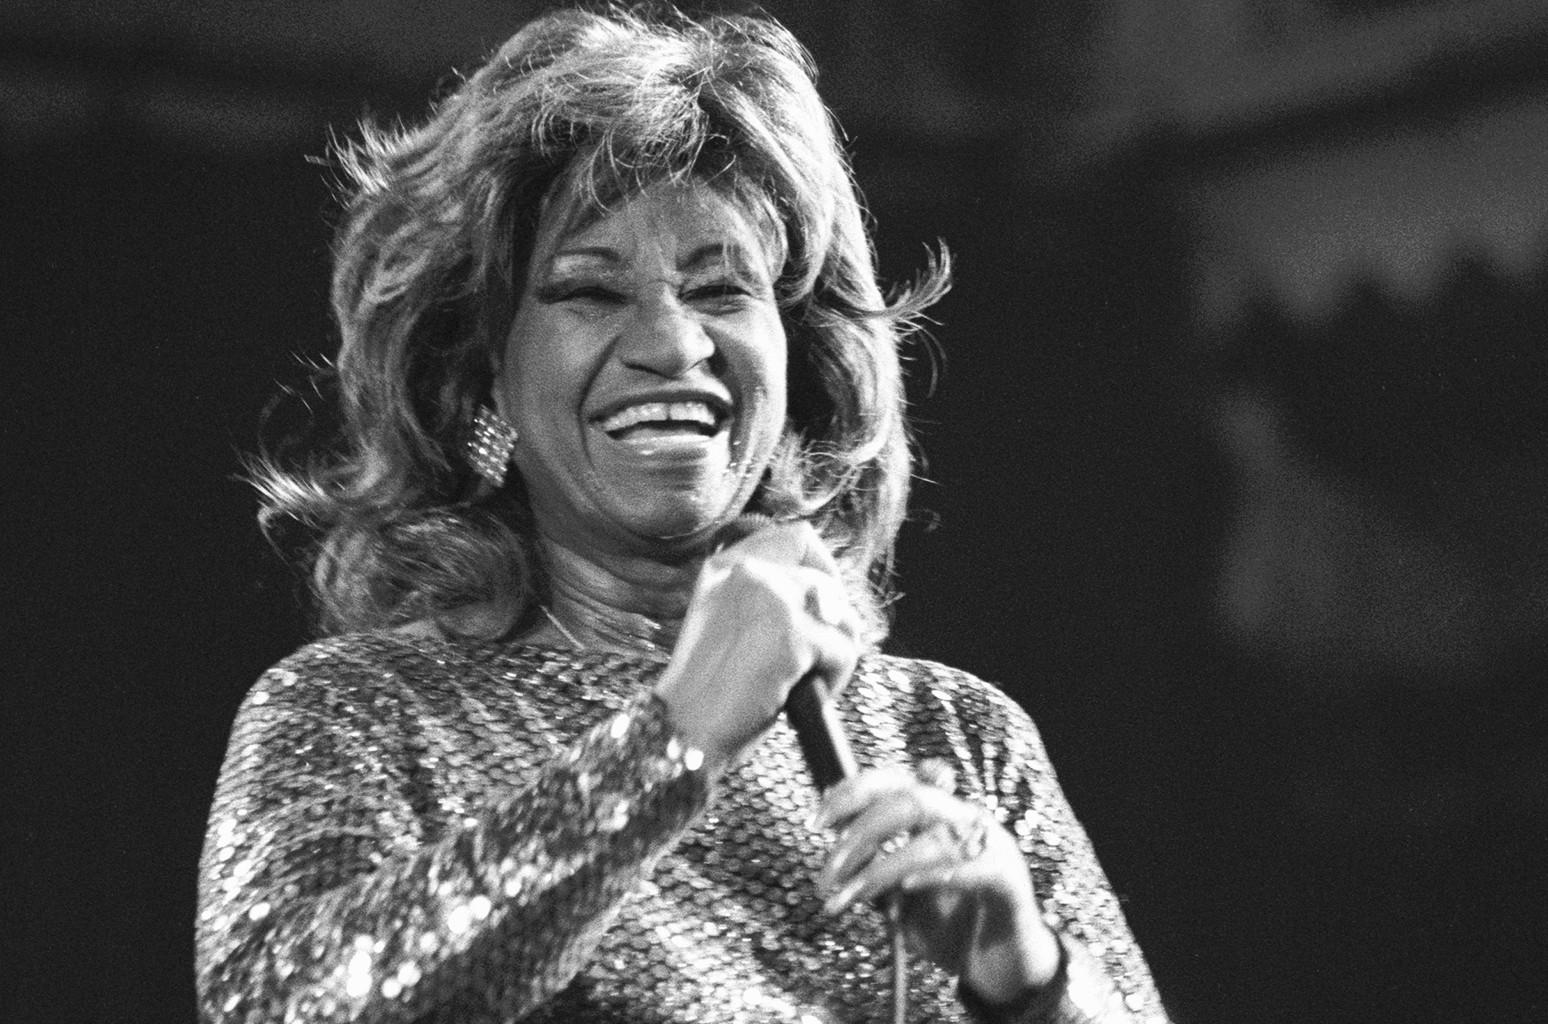 Celia Cruz performs in 1987